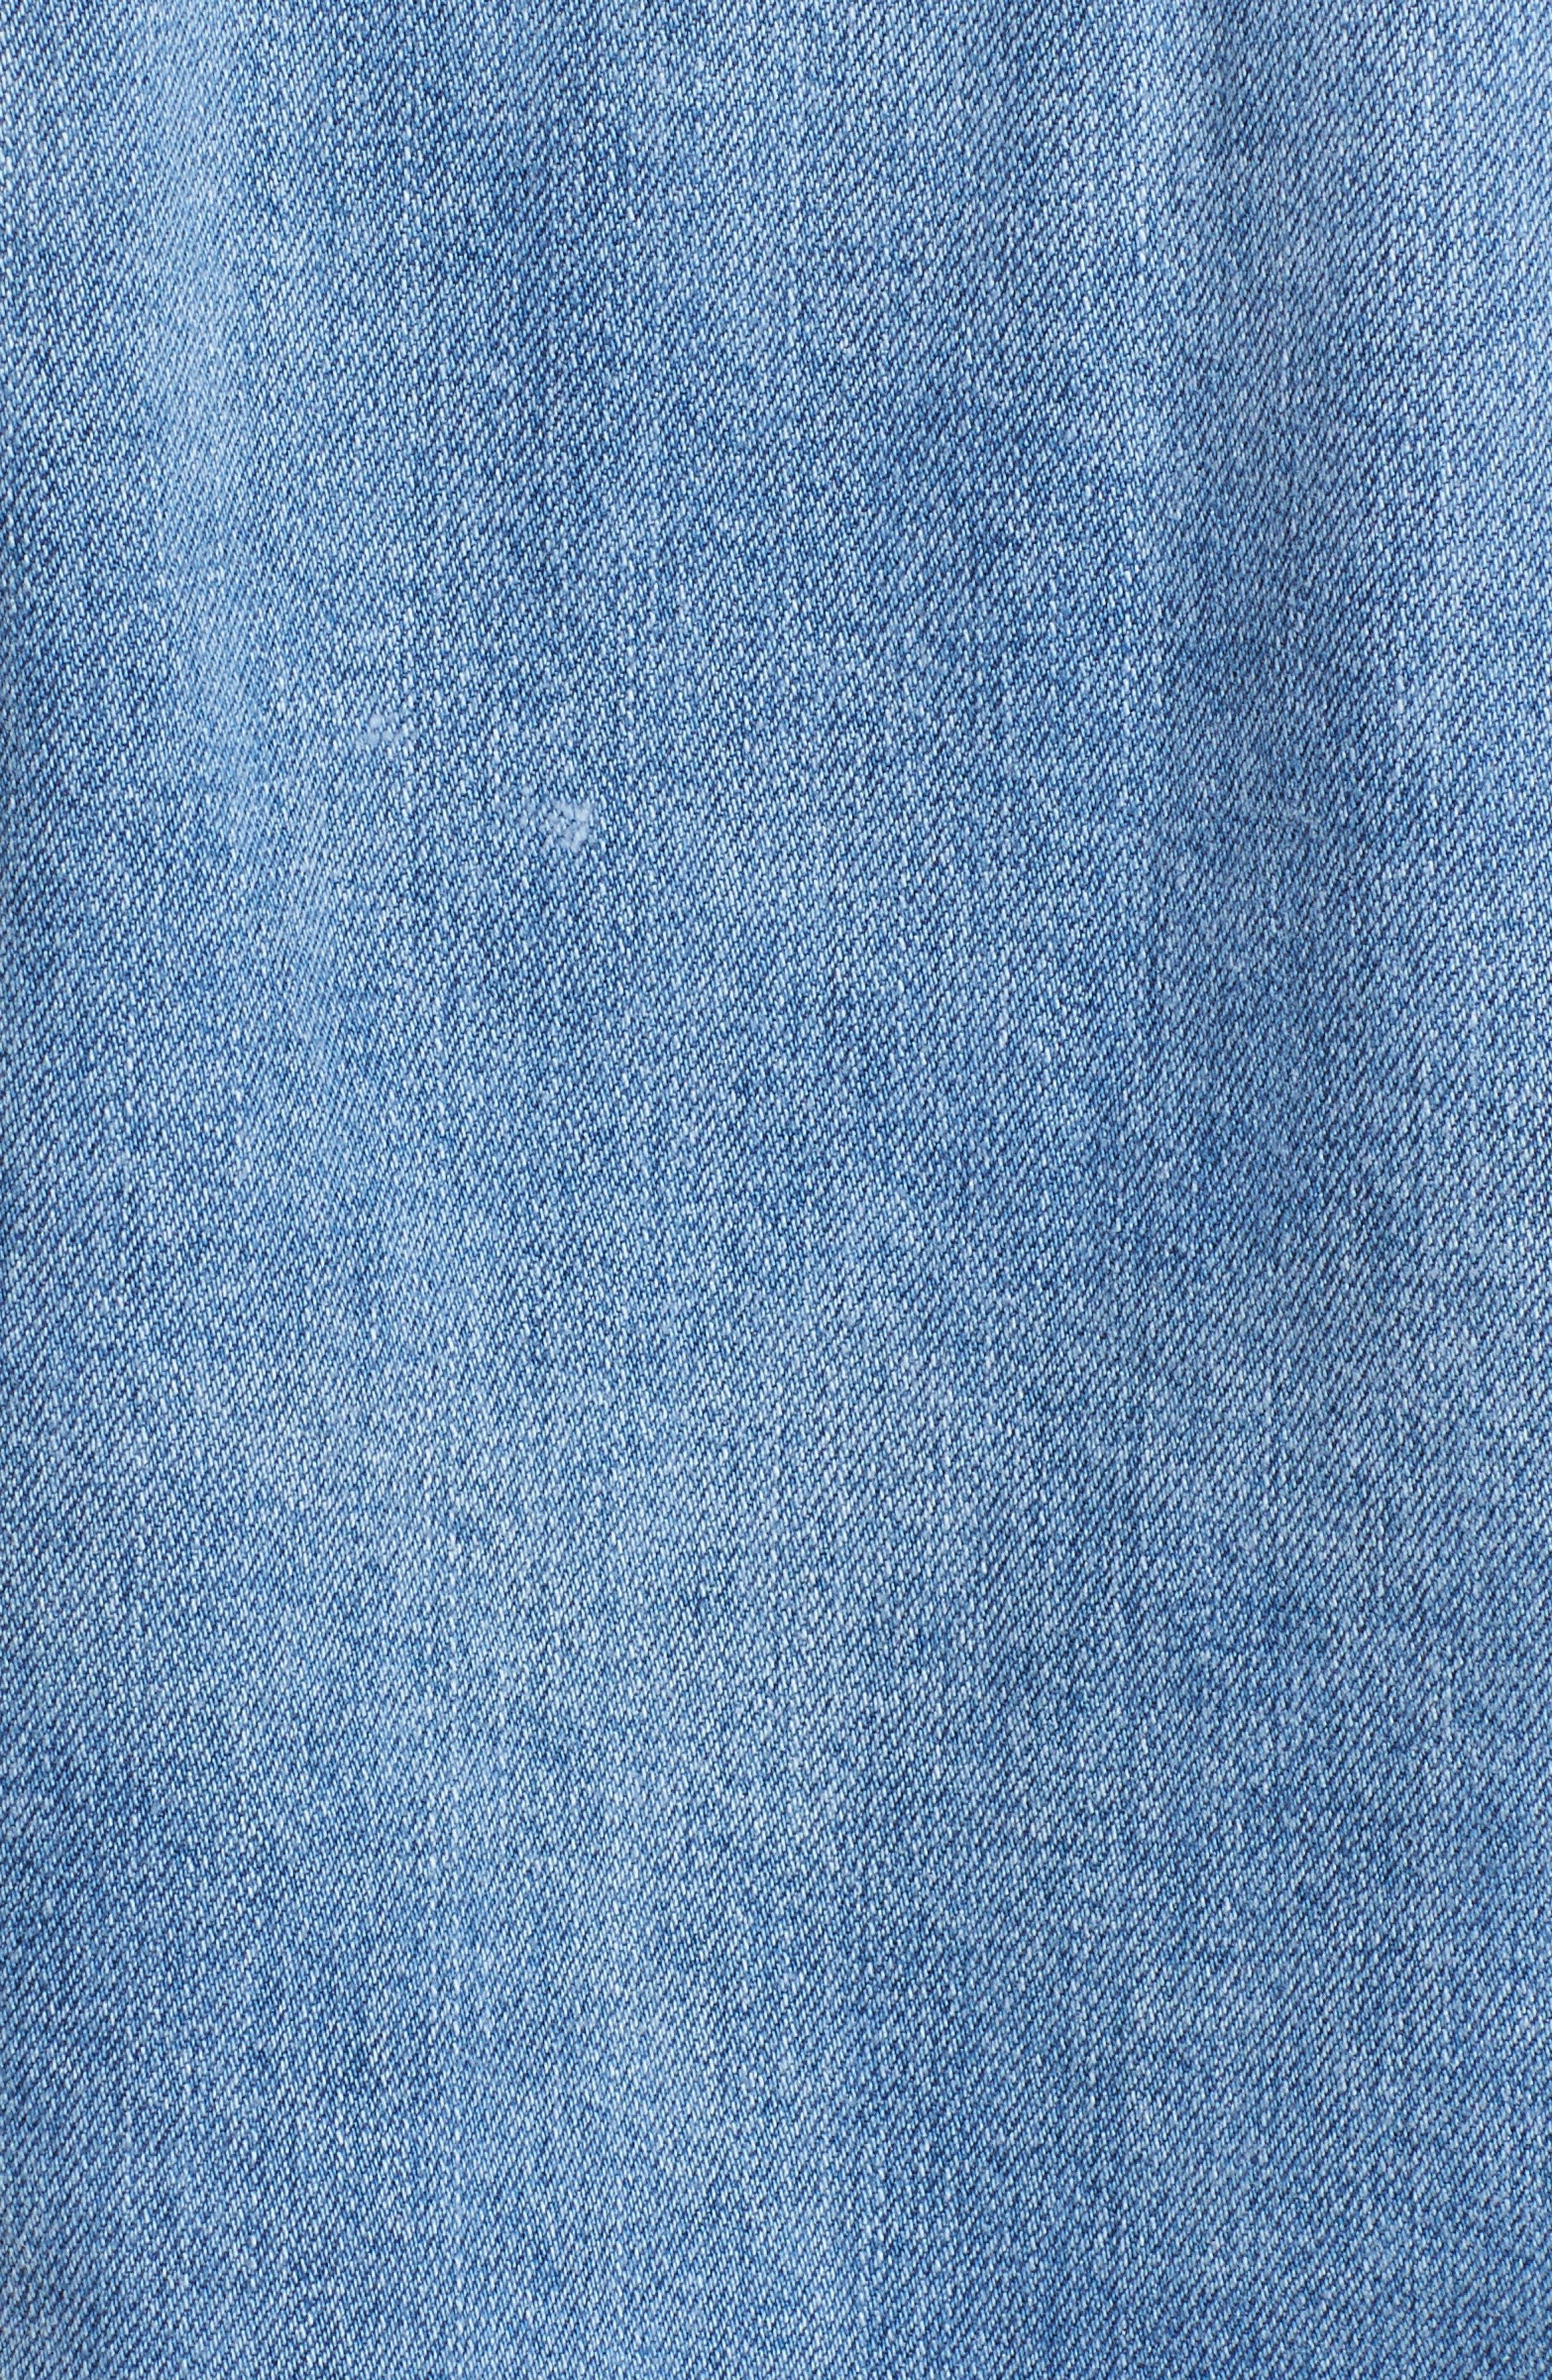 Oversize Crystal Seam Denim Jacket,                             Alternate thumbnail 7, color,                             400